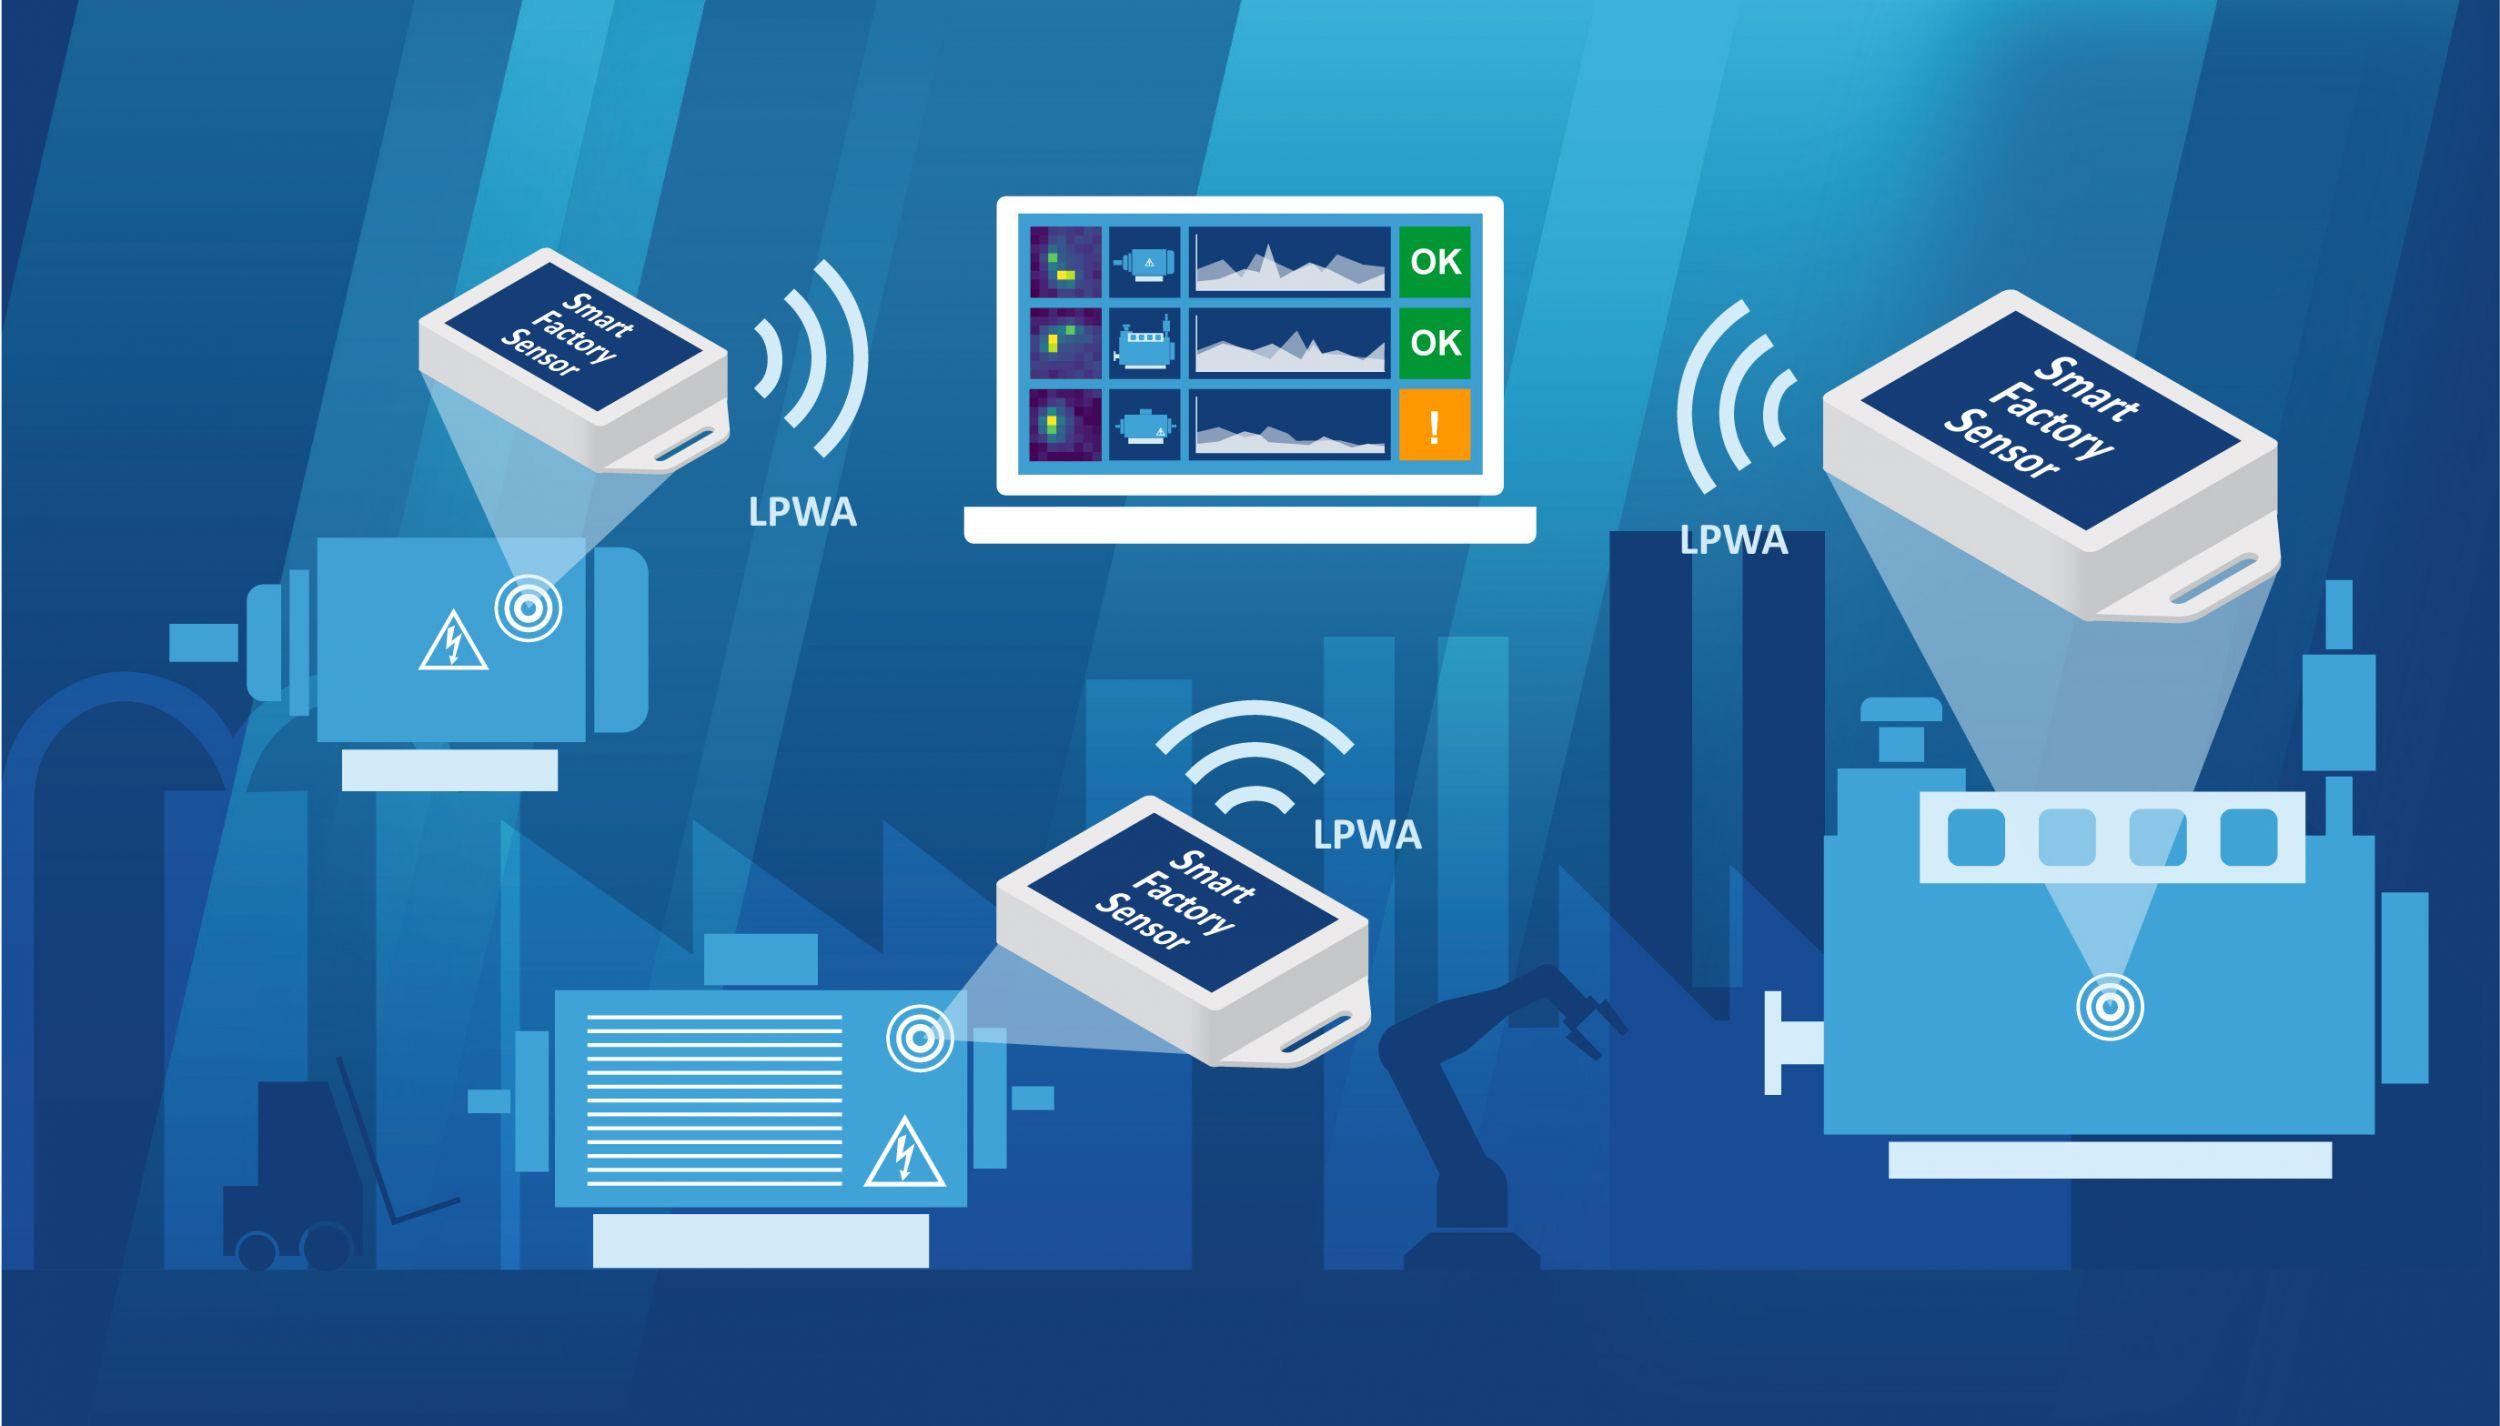 IoT-Monitoring per LPWA-Funkverbindung